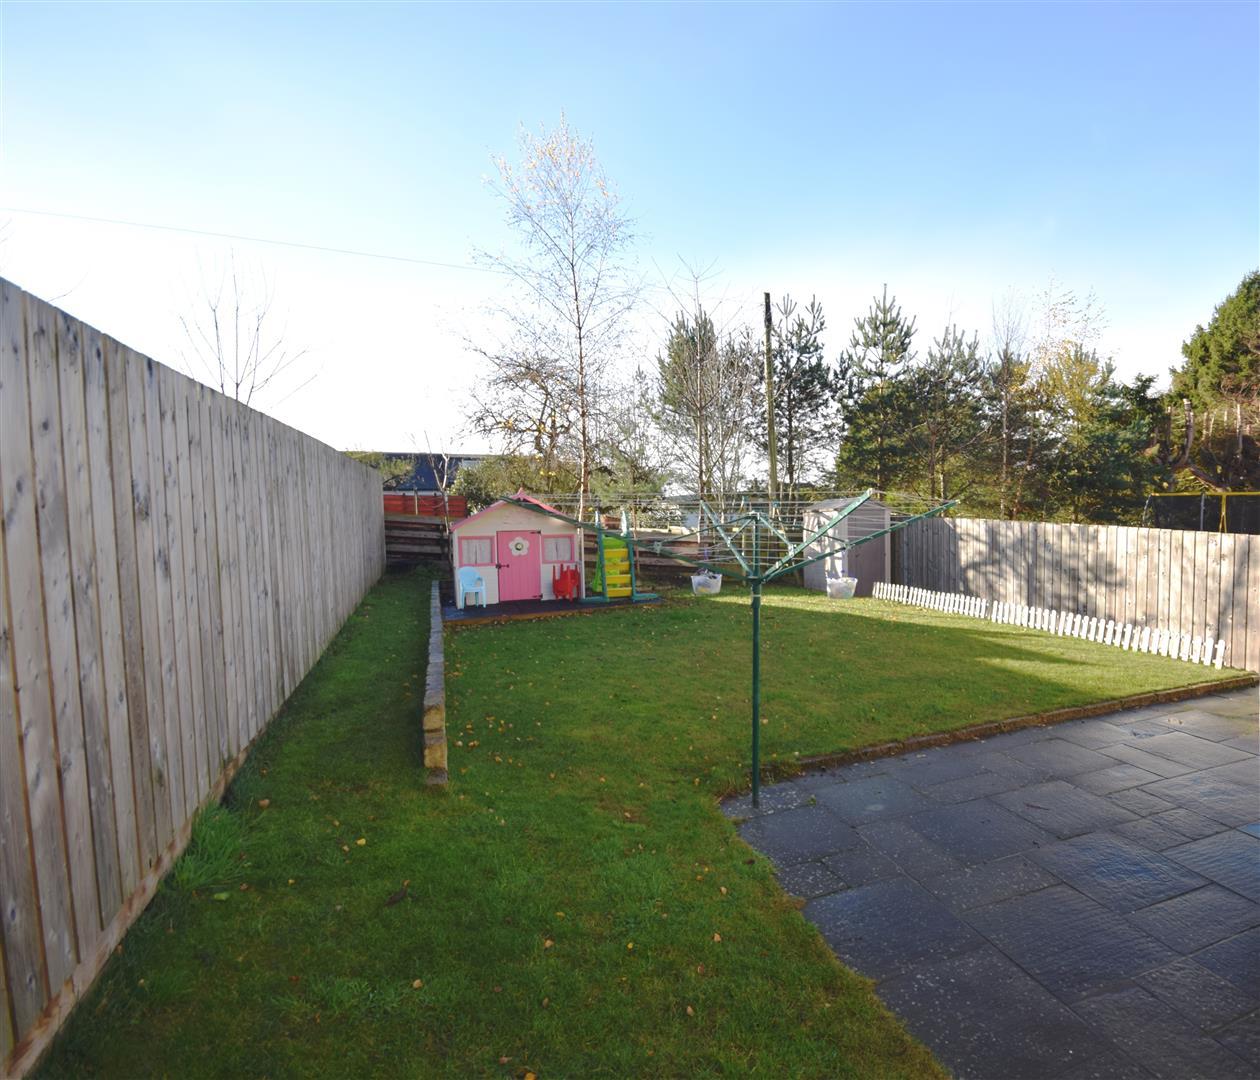 14, Hutchison Drive, Scone, Perthshire, PH2 6GB, UK